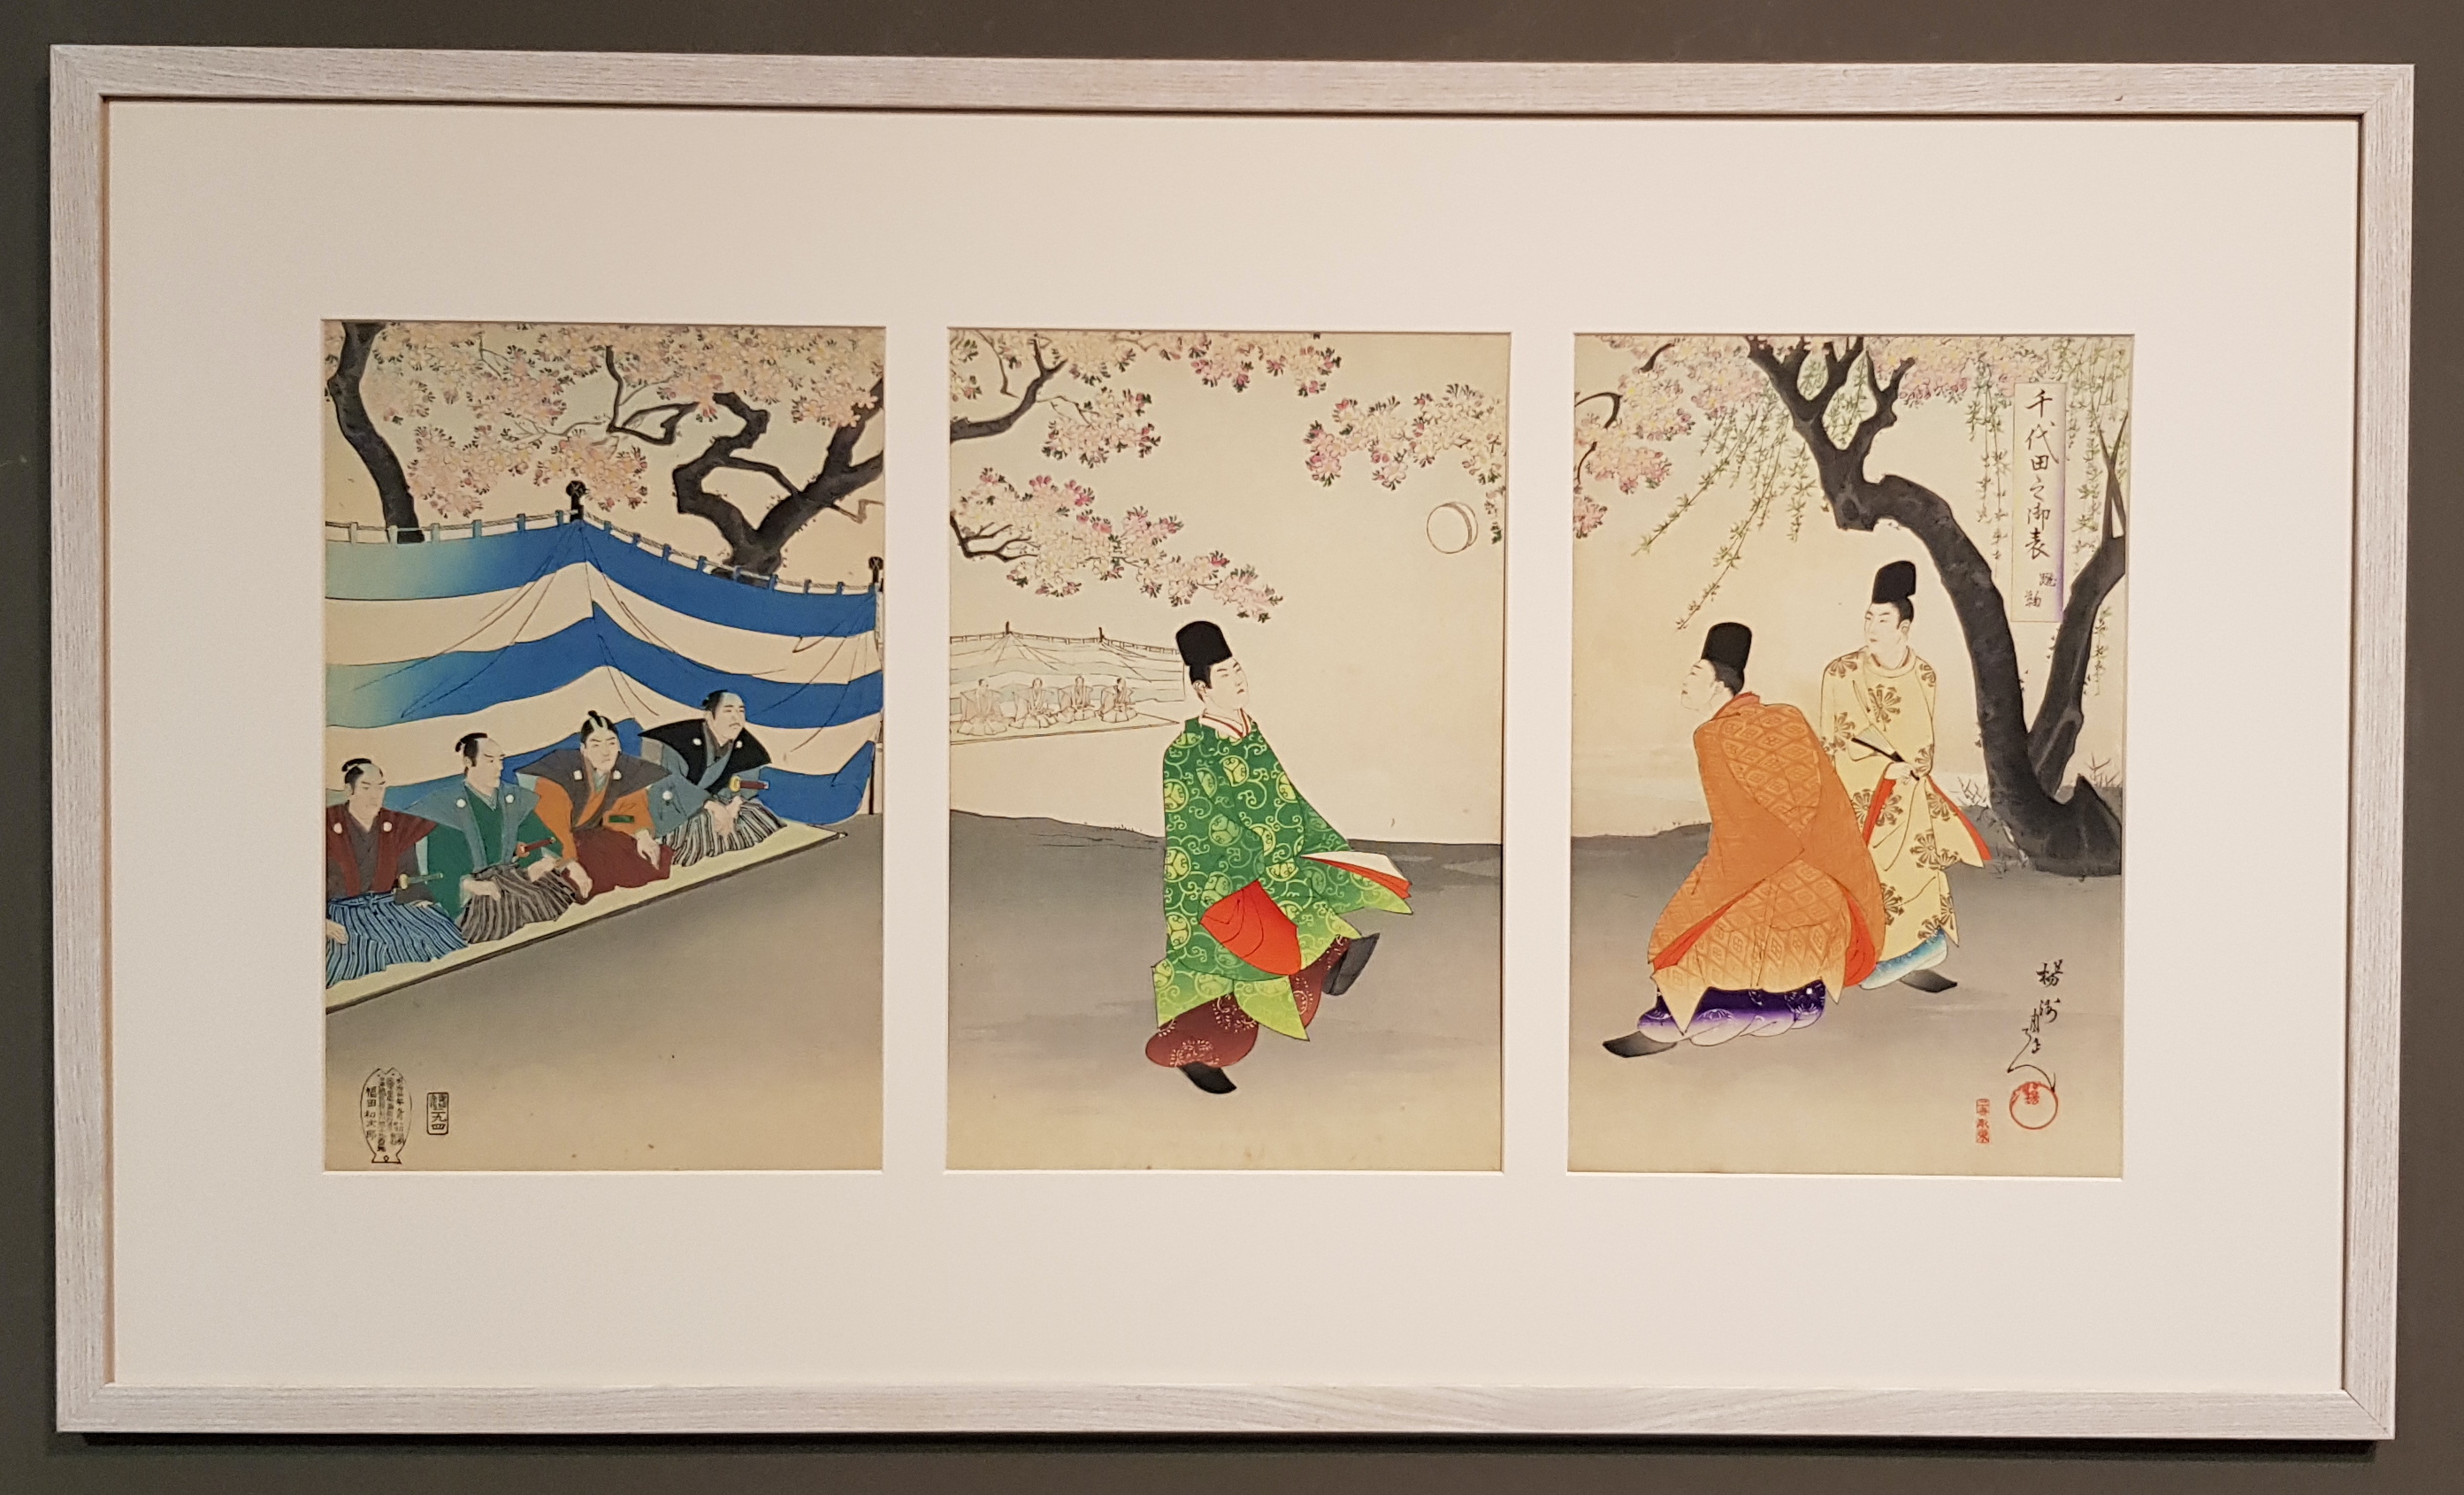 Japon - Estampe Triptyque Chikanobu encadrée - Kemari - Chiyoda no o-omote - 19ème - VENDU Image